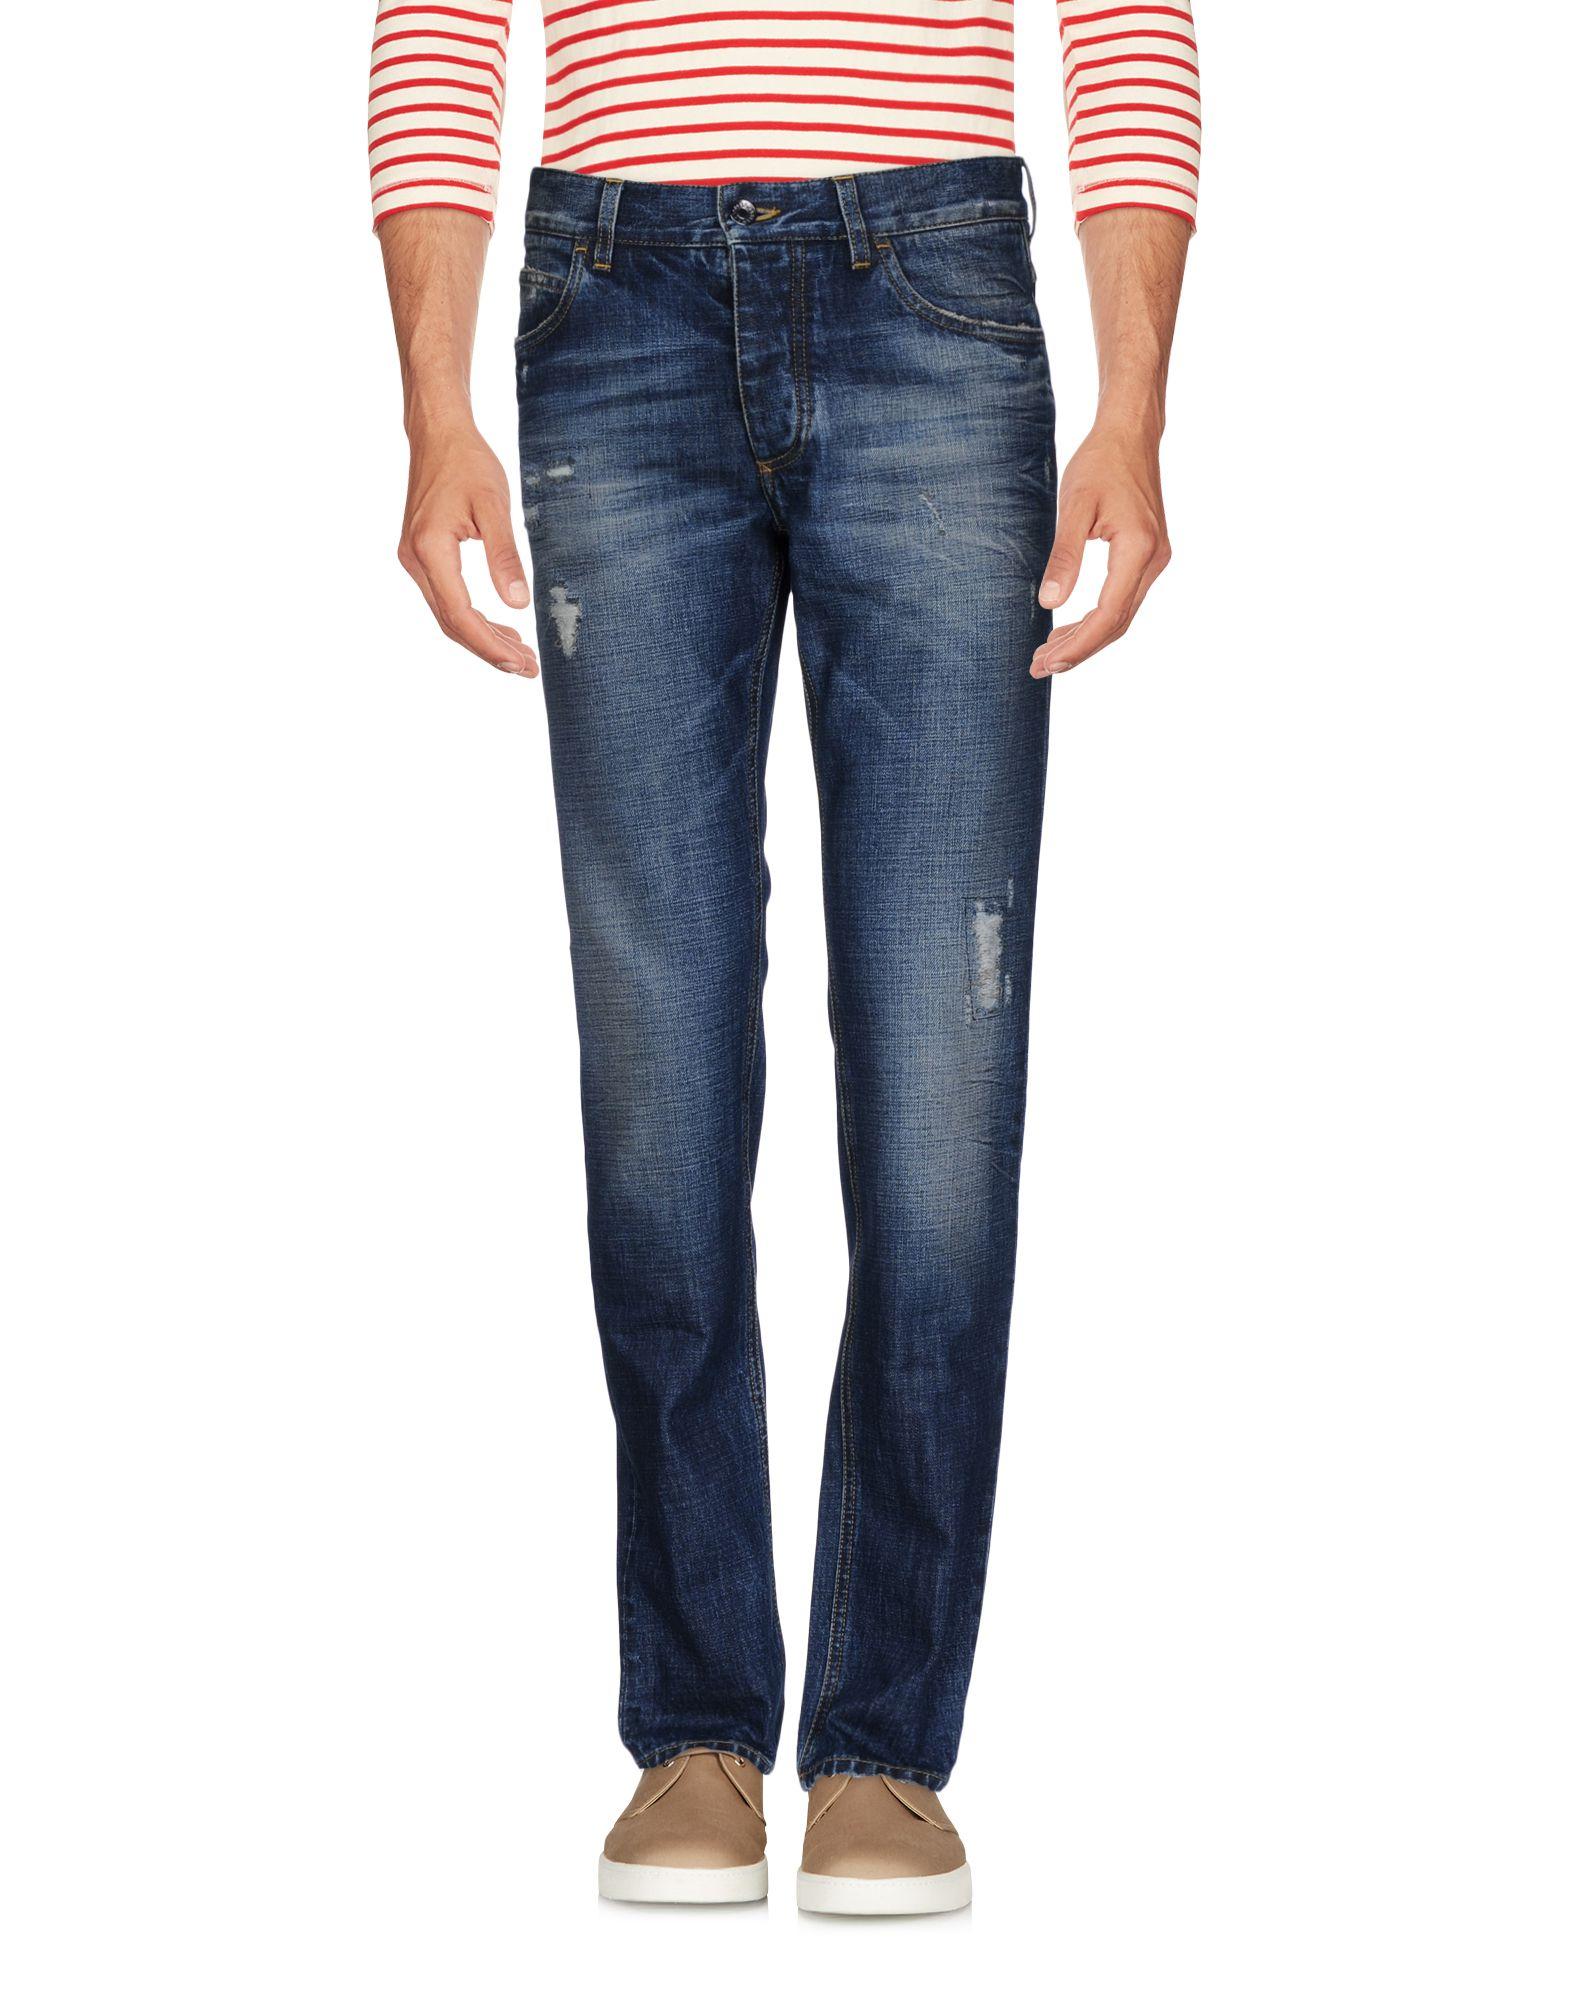 Pantaloni Jeans Dolce & Gabbana Donna - Acquista online su